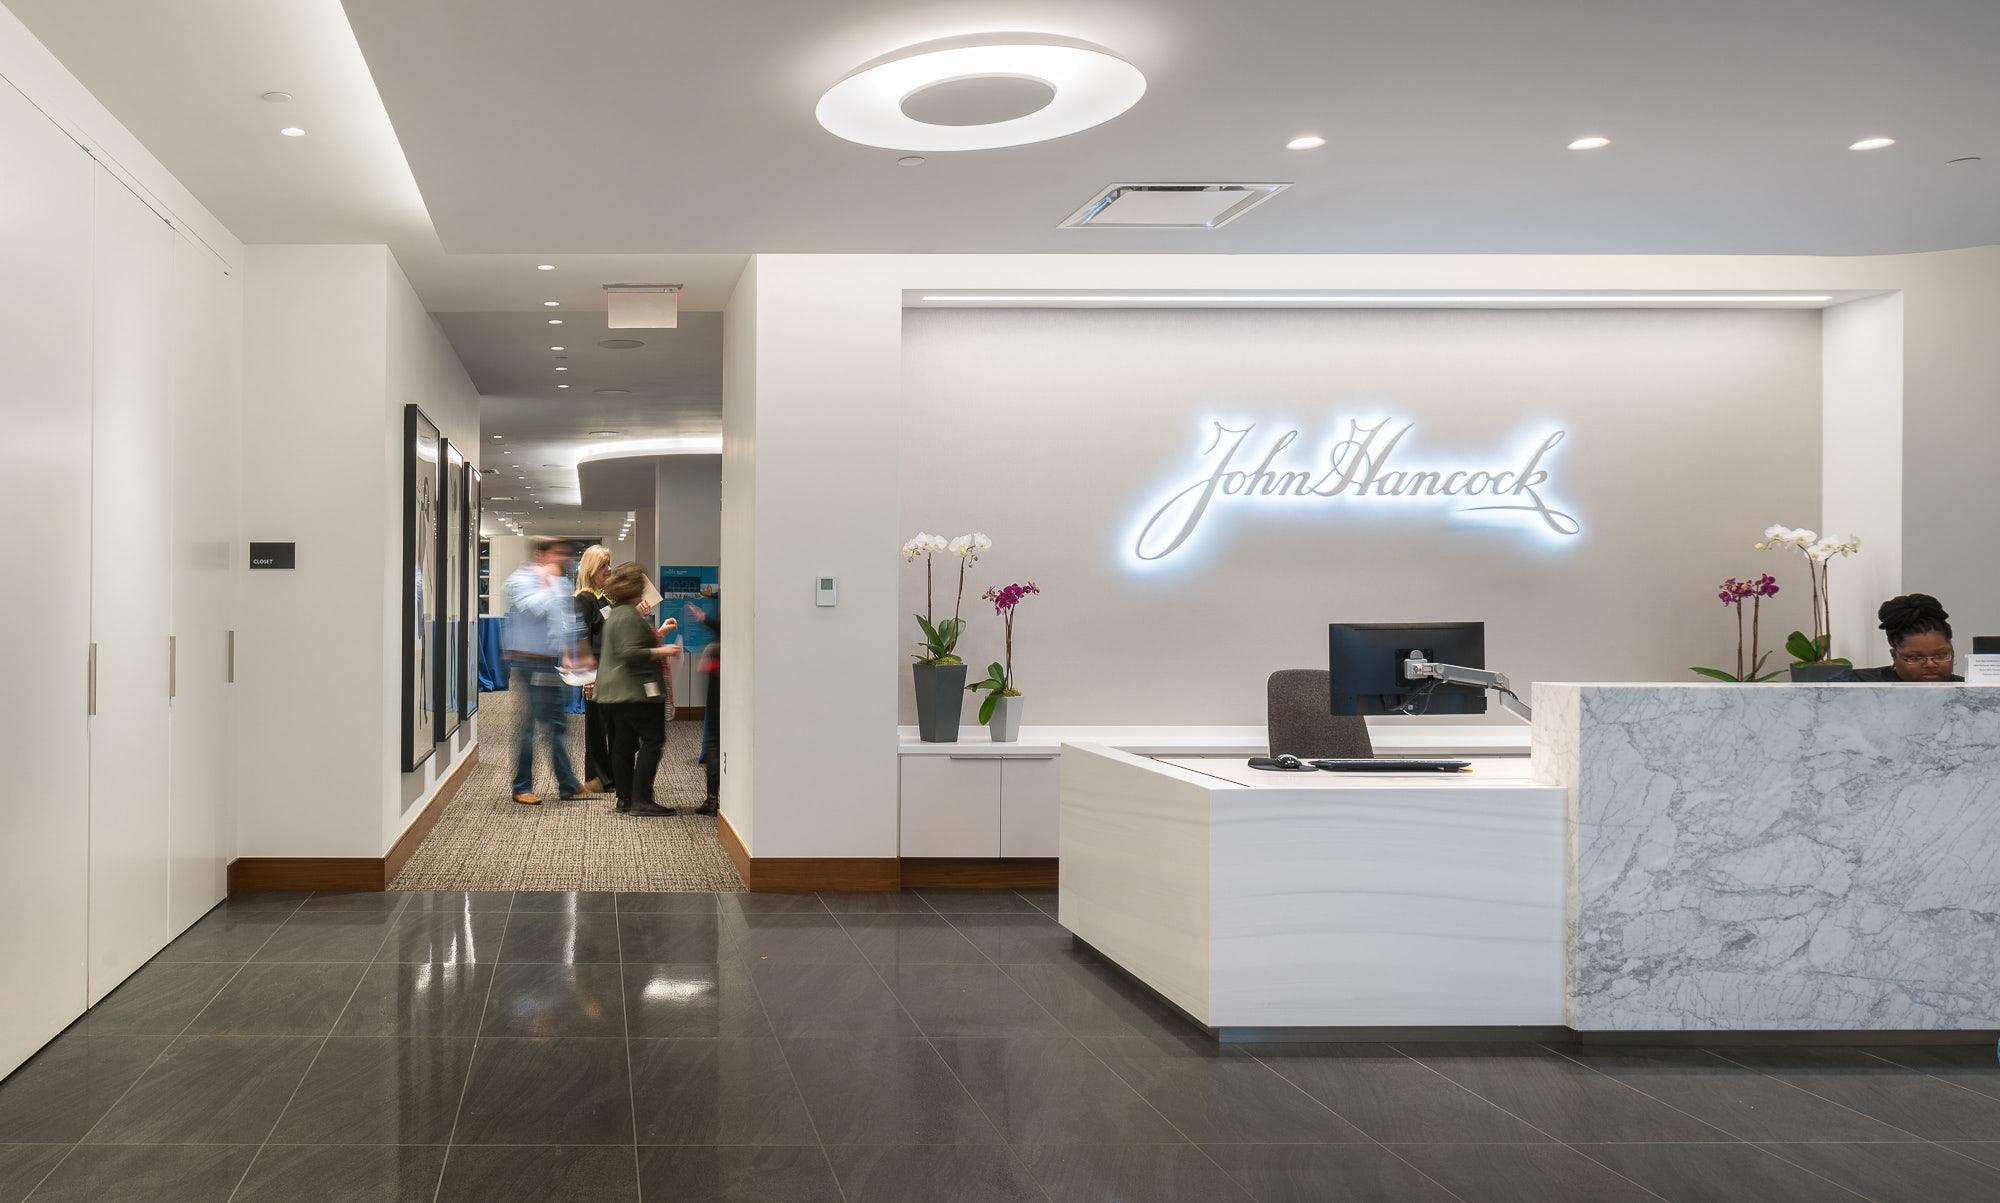 John Hancock Real Estate – Phased Renovations